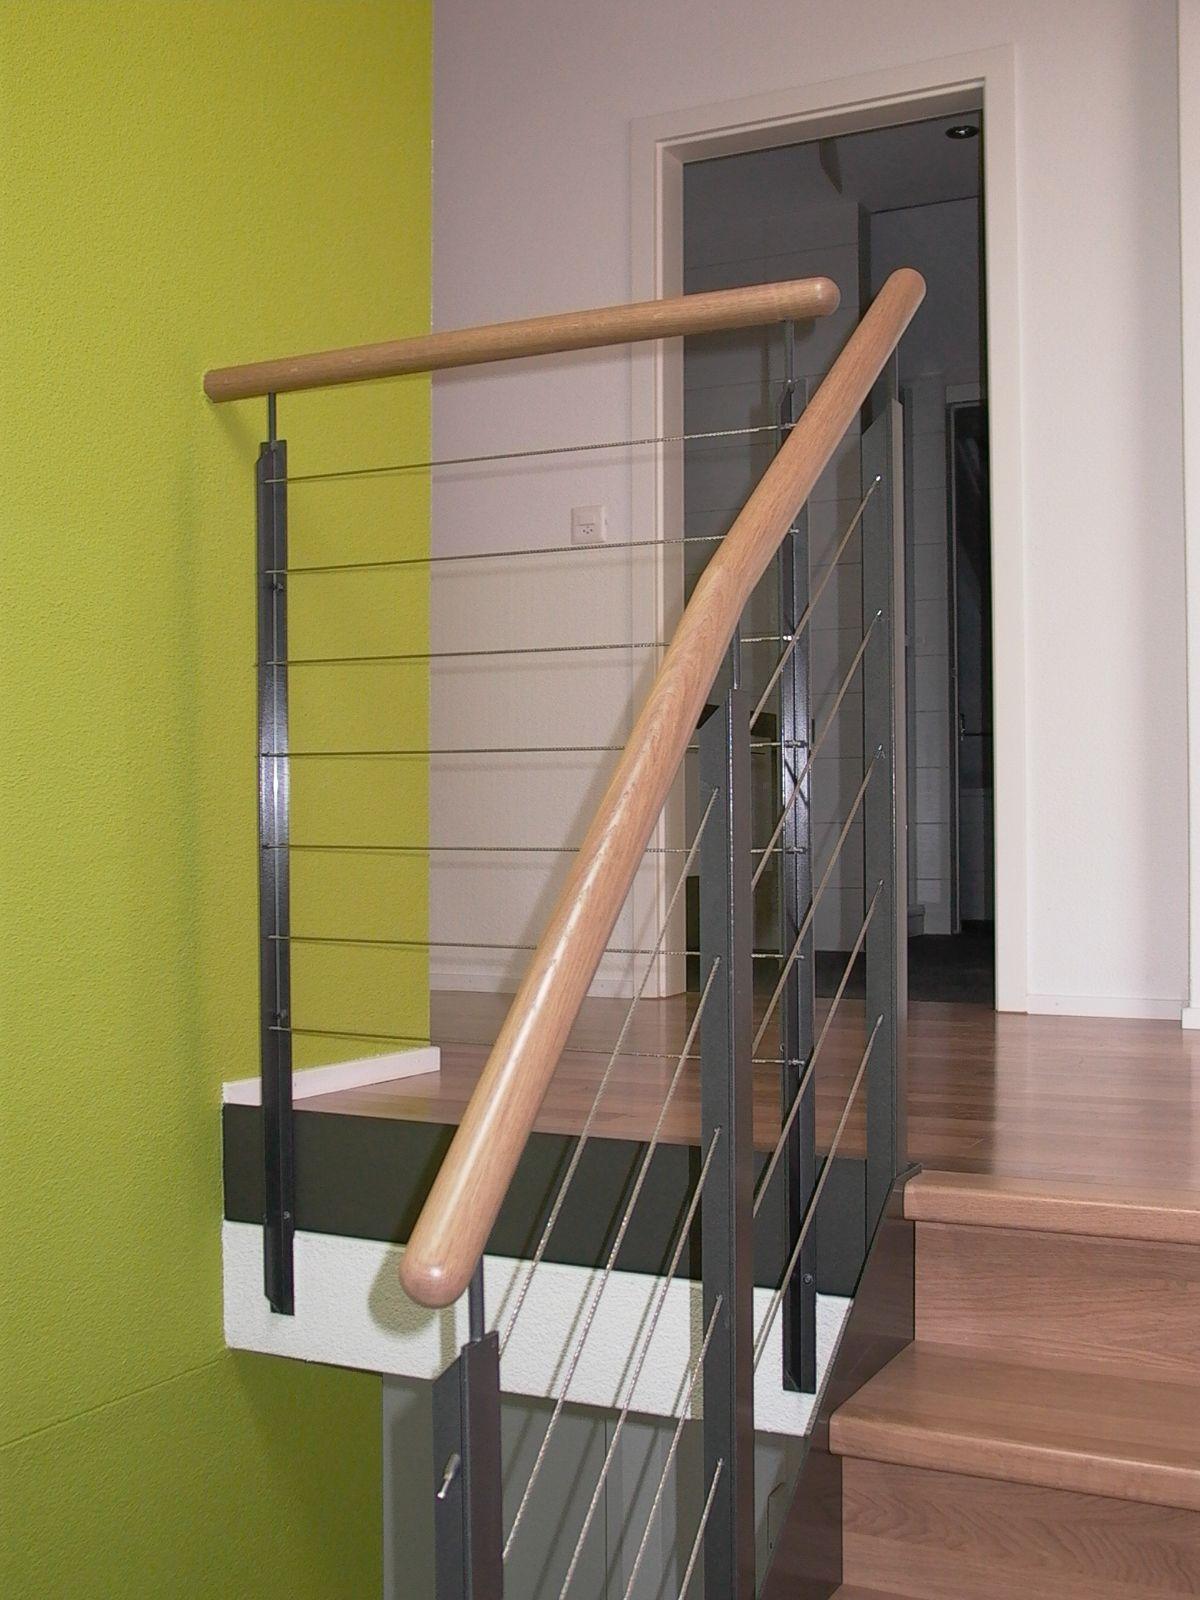 Stair Image 381